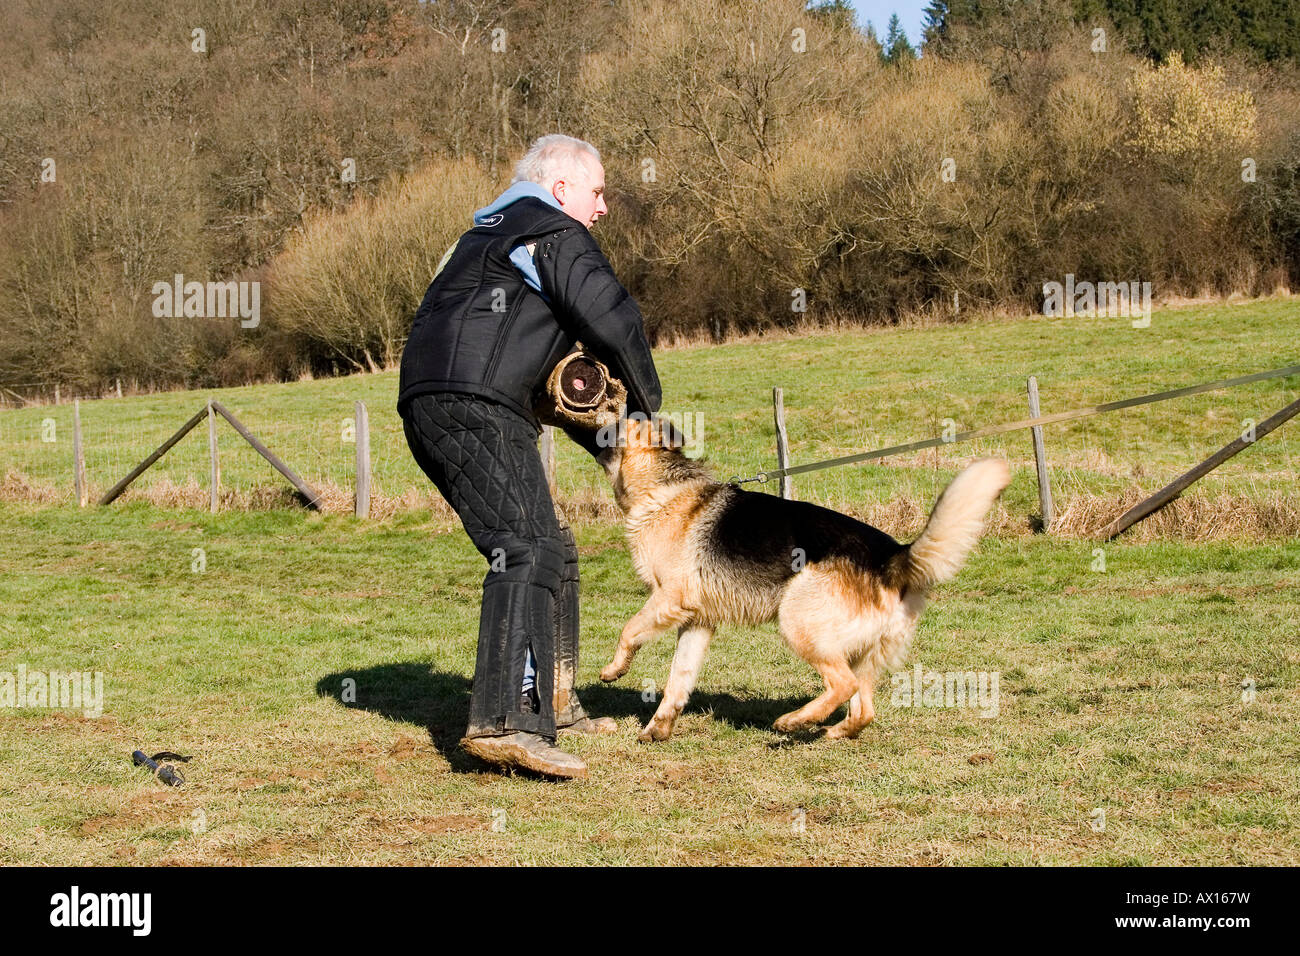 Man training a German shepherd dog in protective behavior in Daun, Vulkaneifel, Germany, Europe - Stock Image